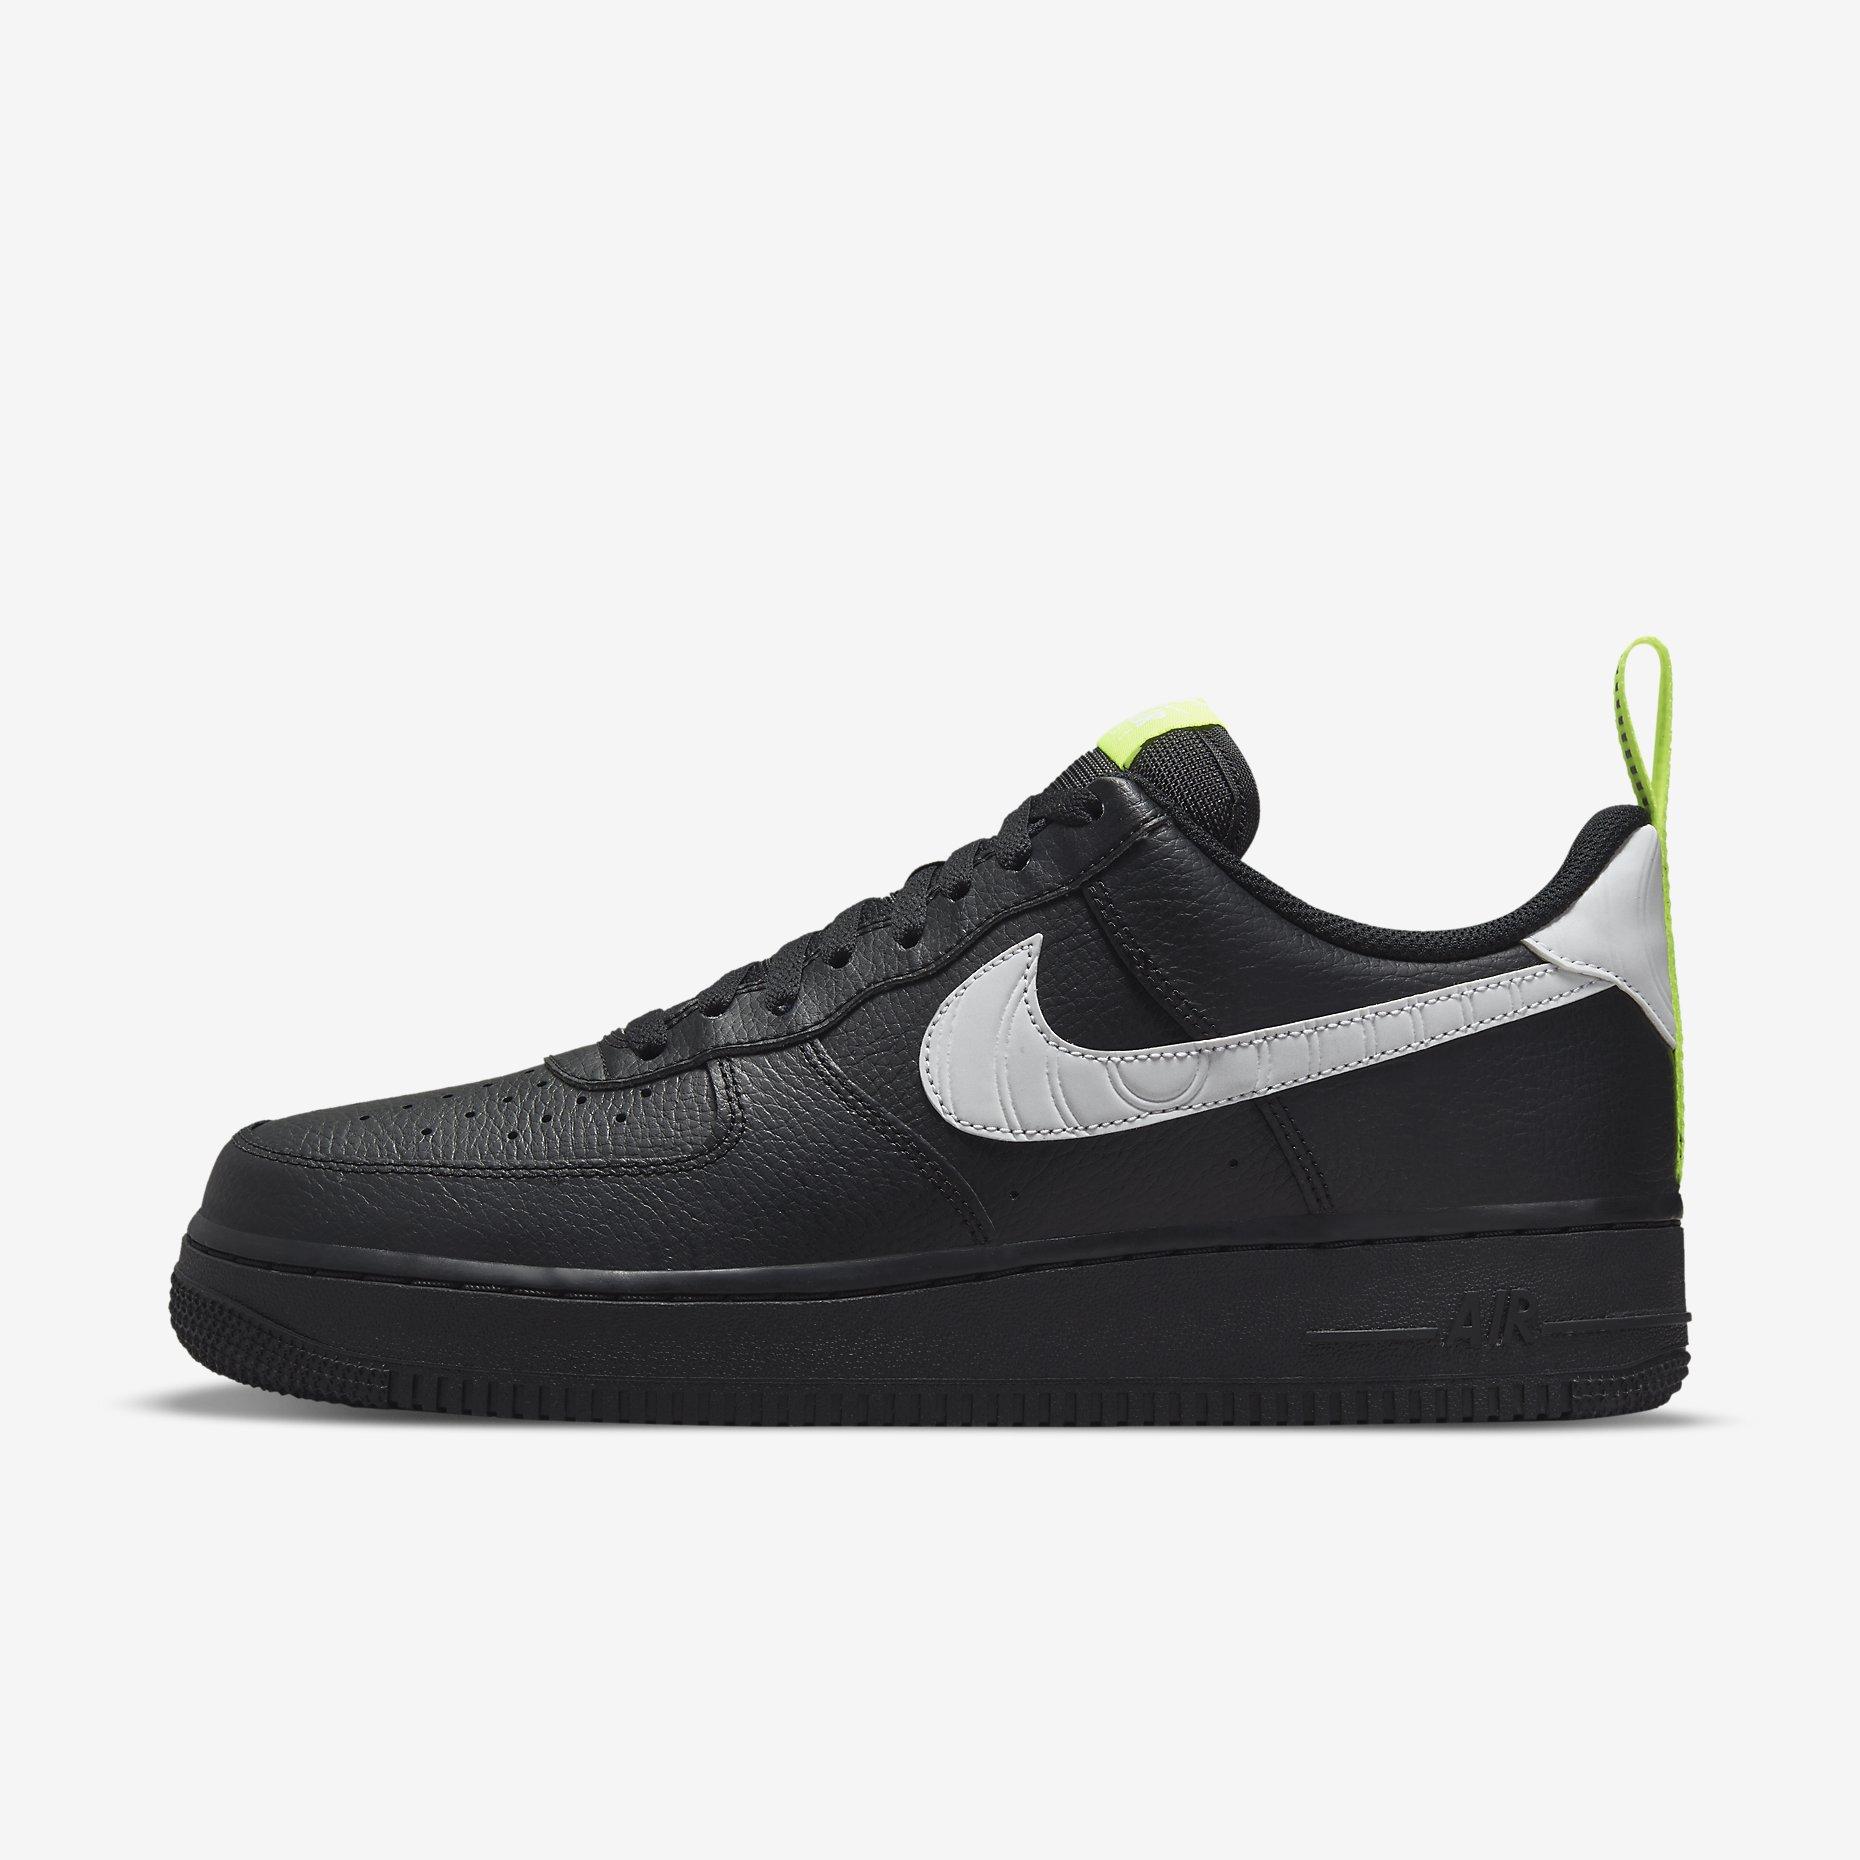 Nike Air Force 1 Low 'Black' - 'Pivot Point'